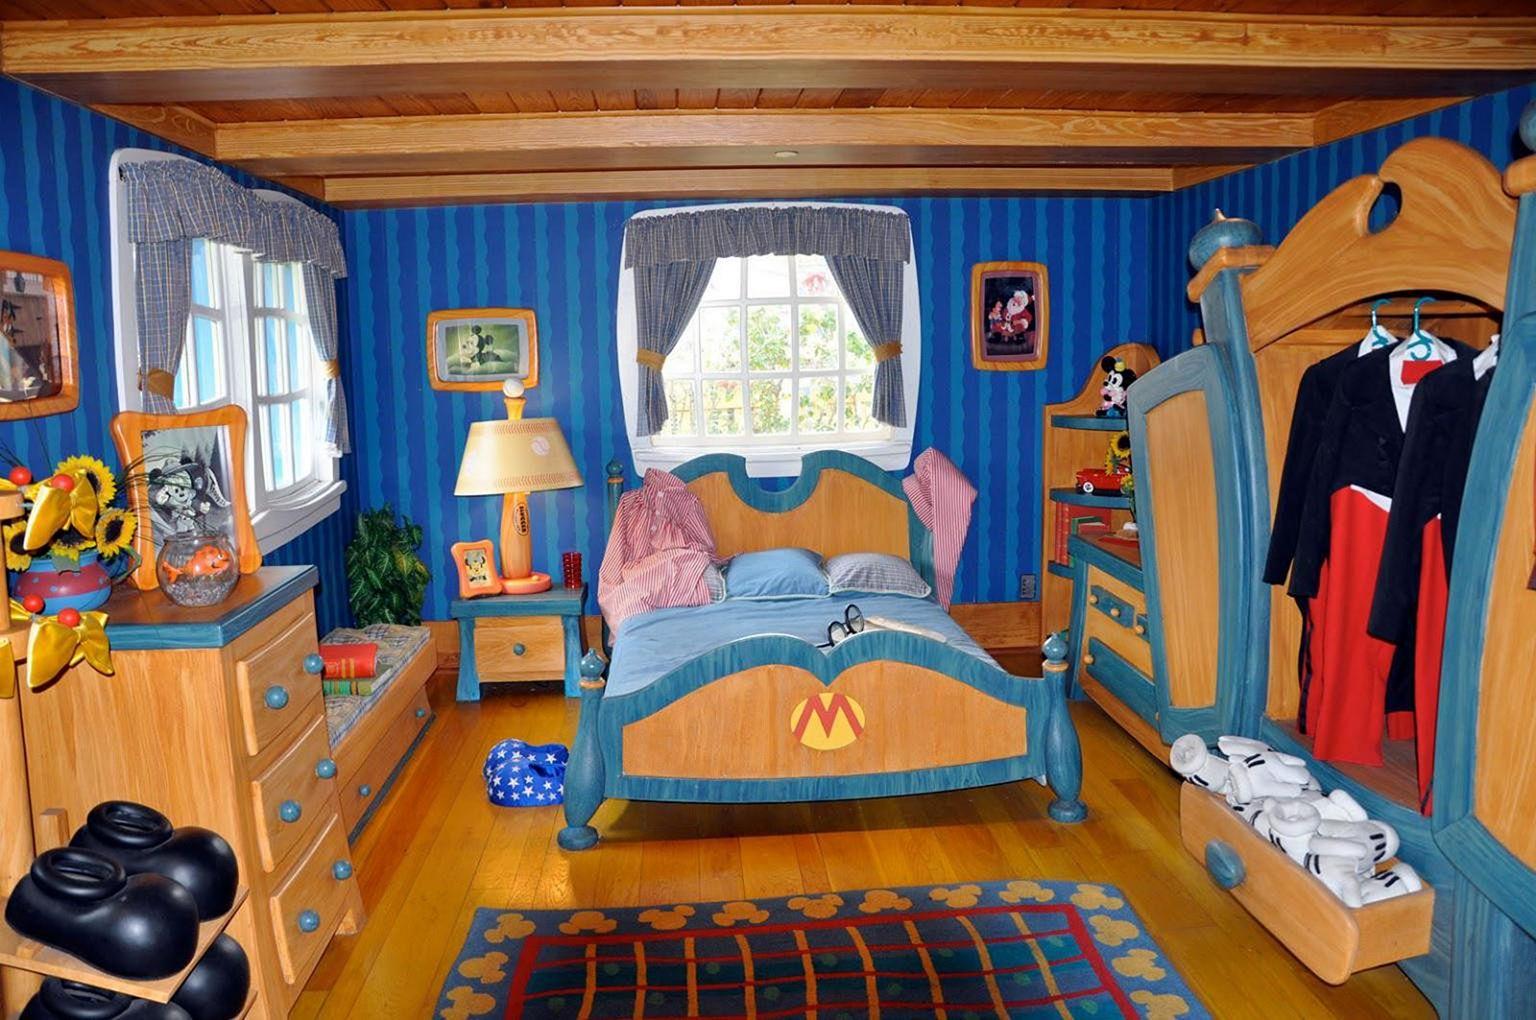 Mickey Mouse House Disney World Decoredo Home Decorators Catalog Best Ideas of Home Decor and Design [homedecoratorscatalog.us]